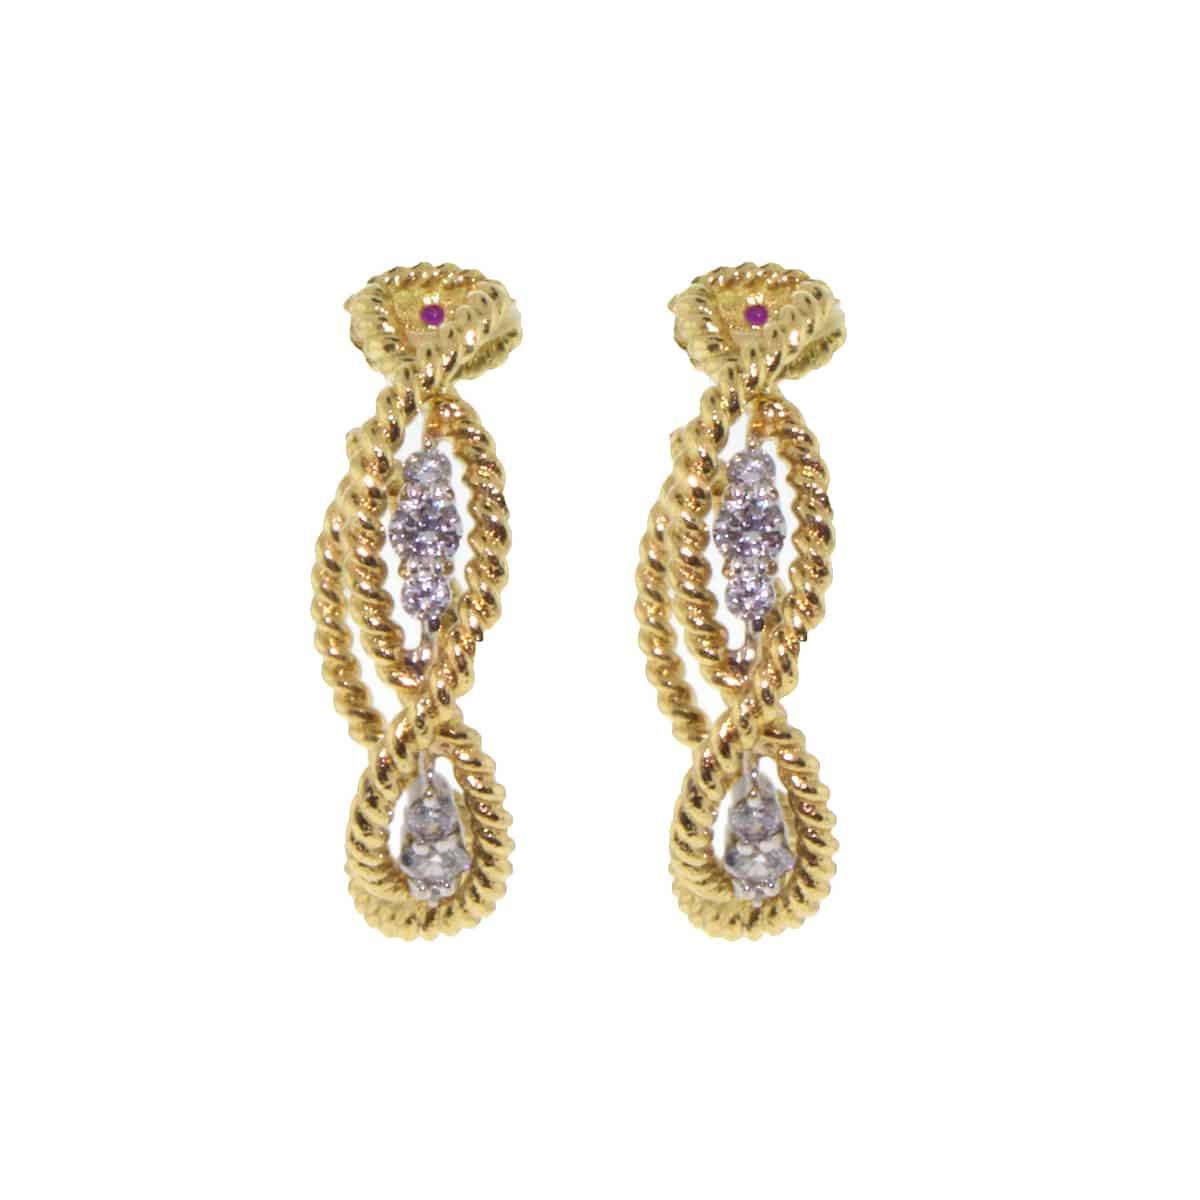 18k Yellow Gold Barocco Diamond Earrings